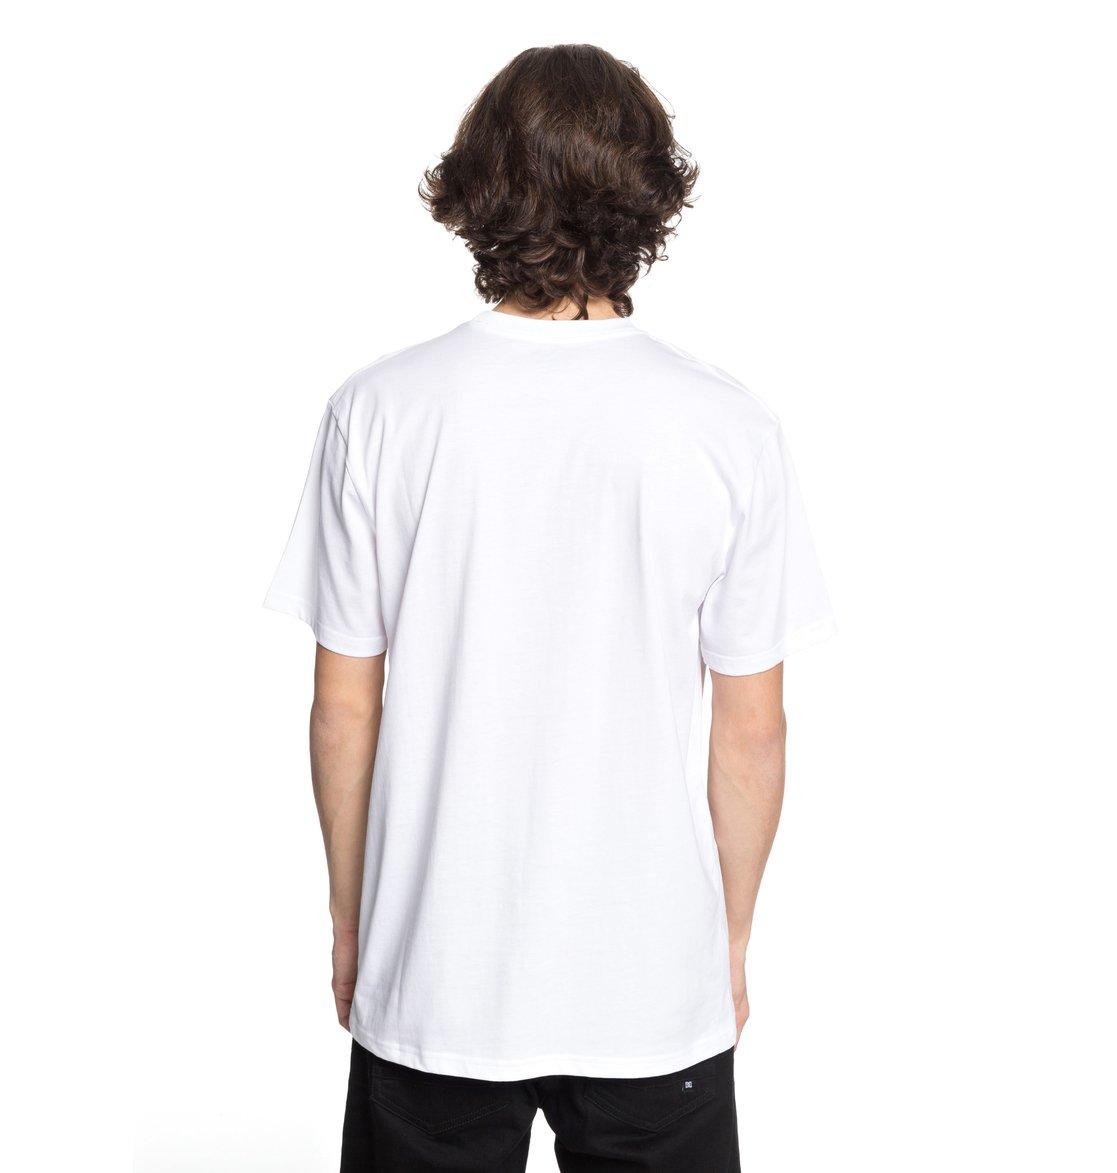 DC-Shoes-City-To-State-Camiseta-para-Hombre-EDYZT03765